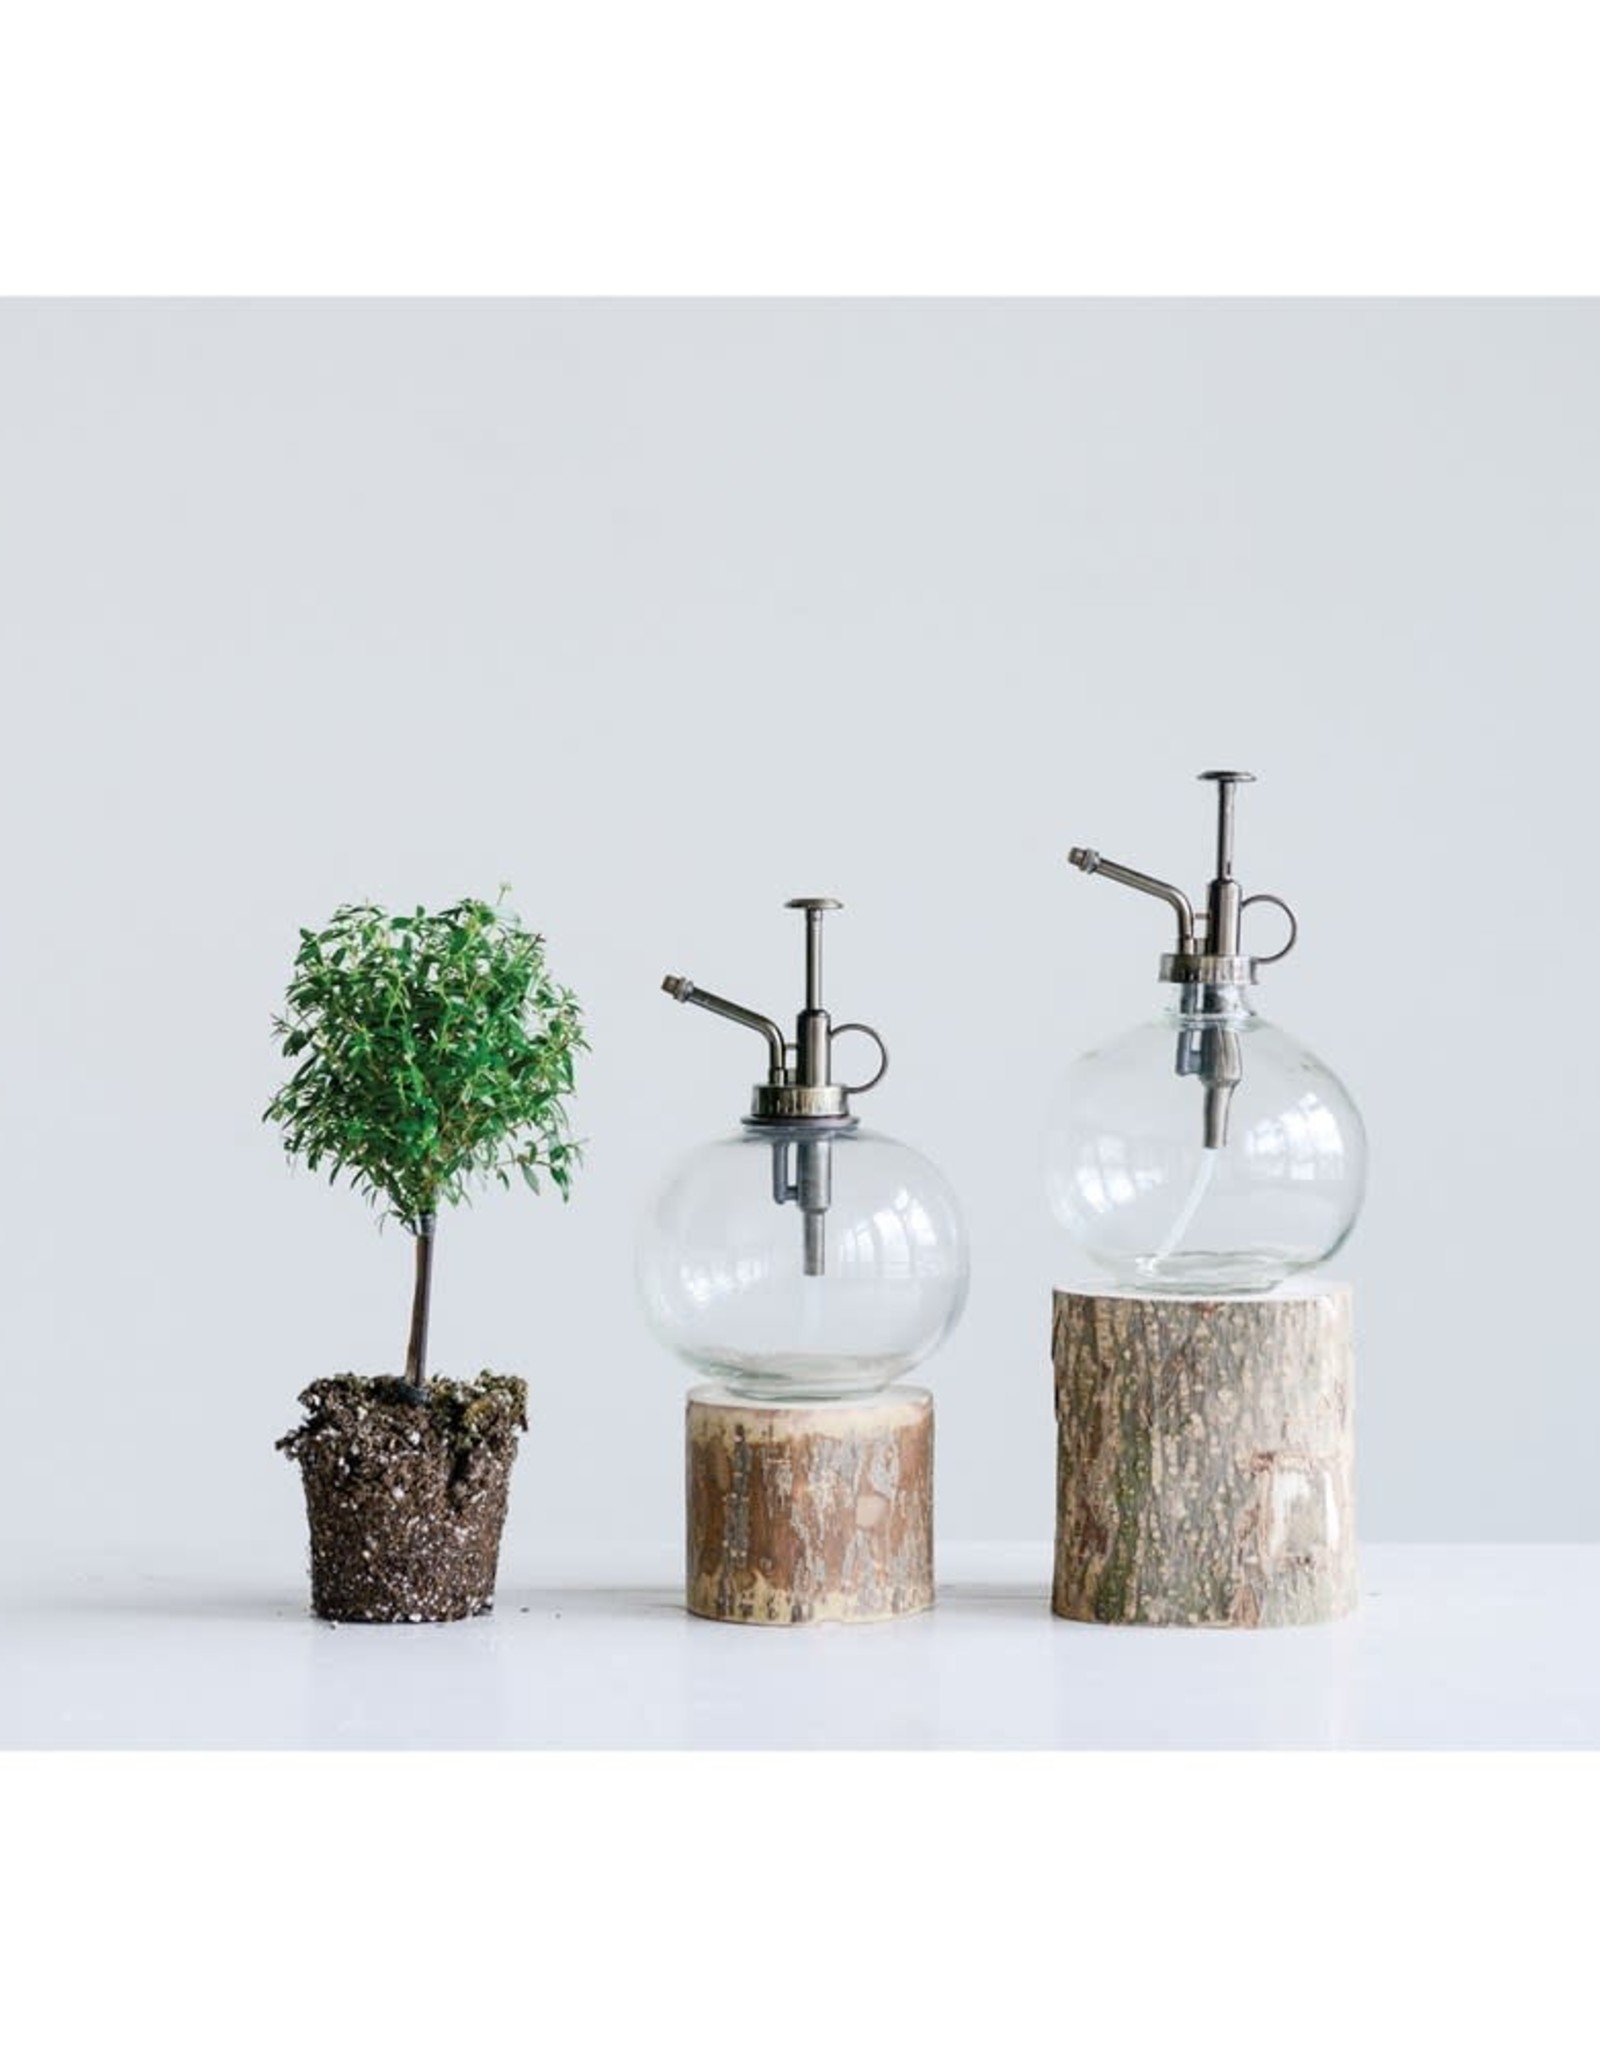 Wink Glass Plant Mister